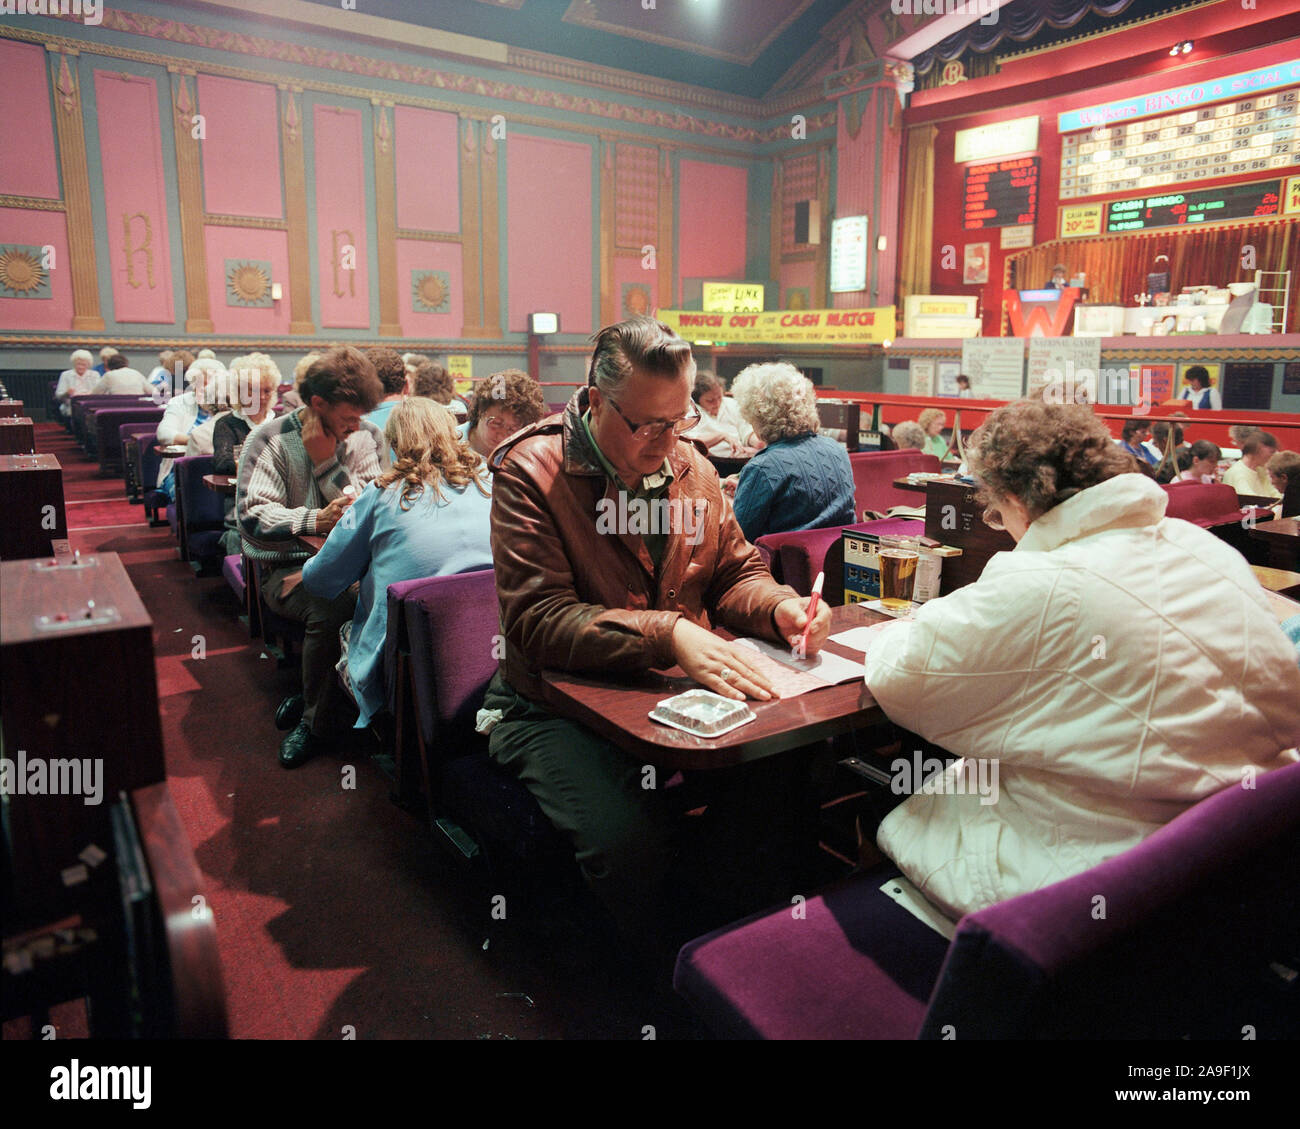 safest online casinos usa for real money